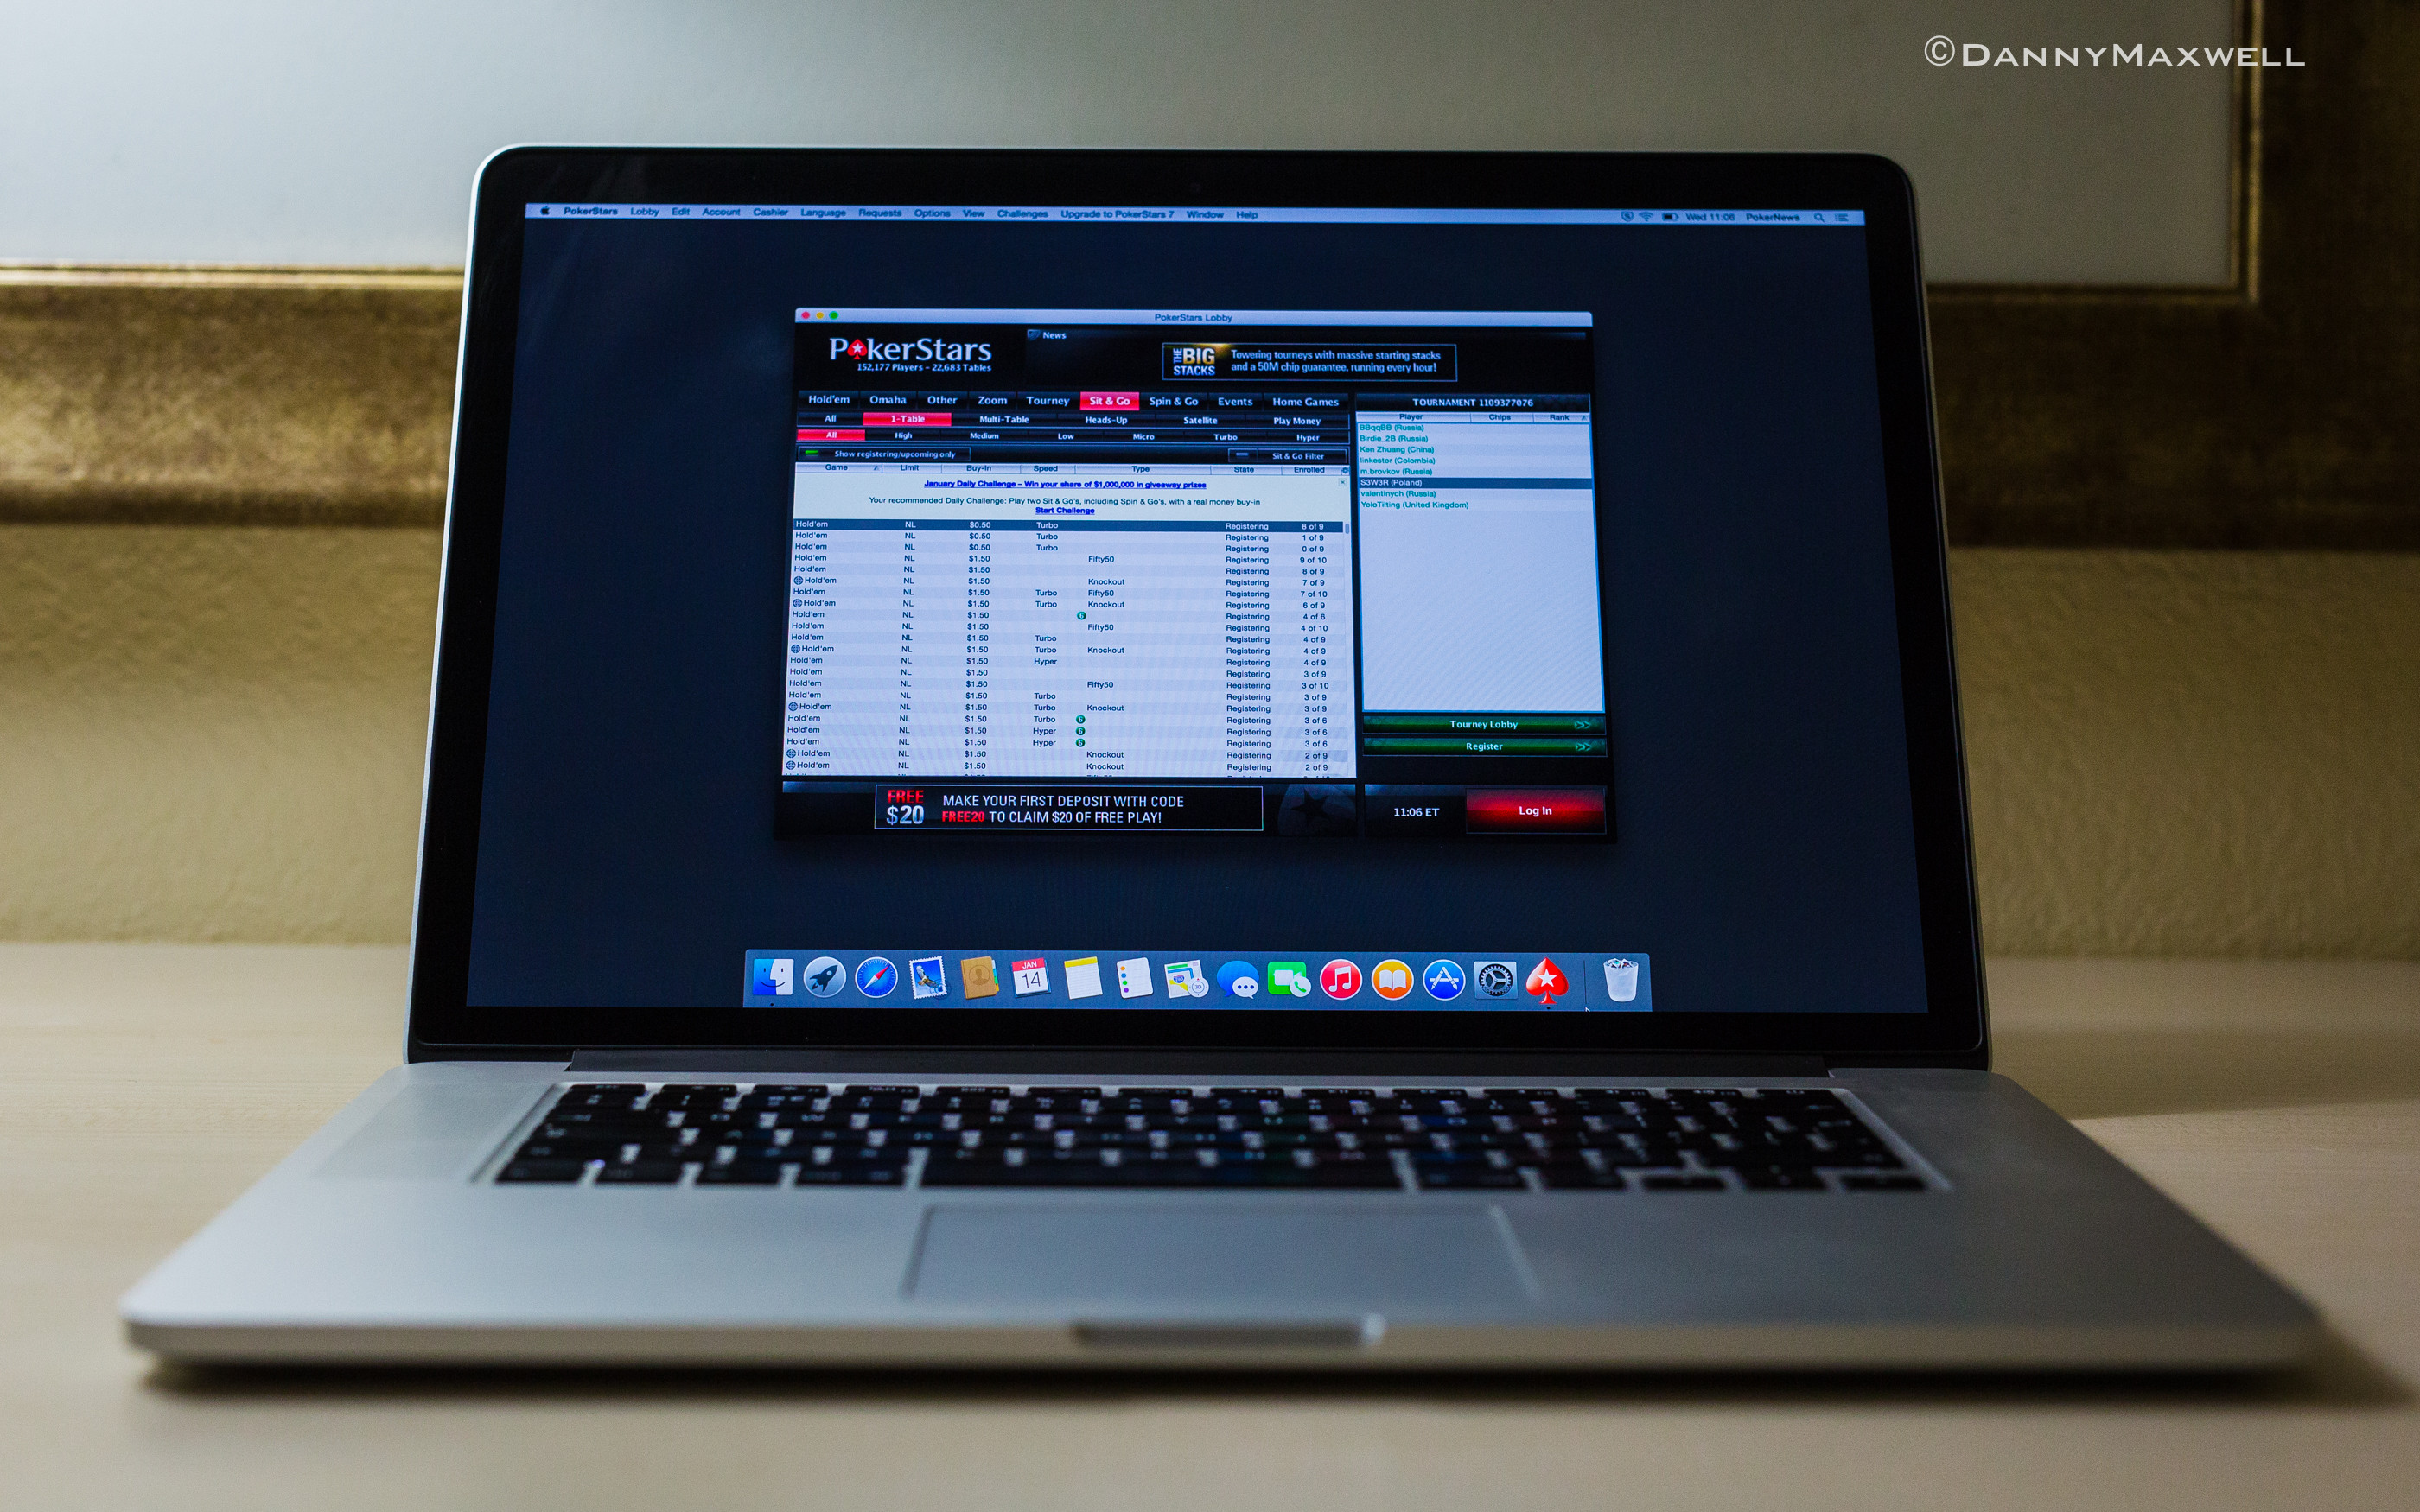 Pokerstars Login Password